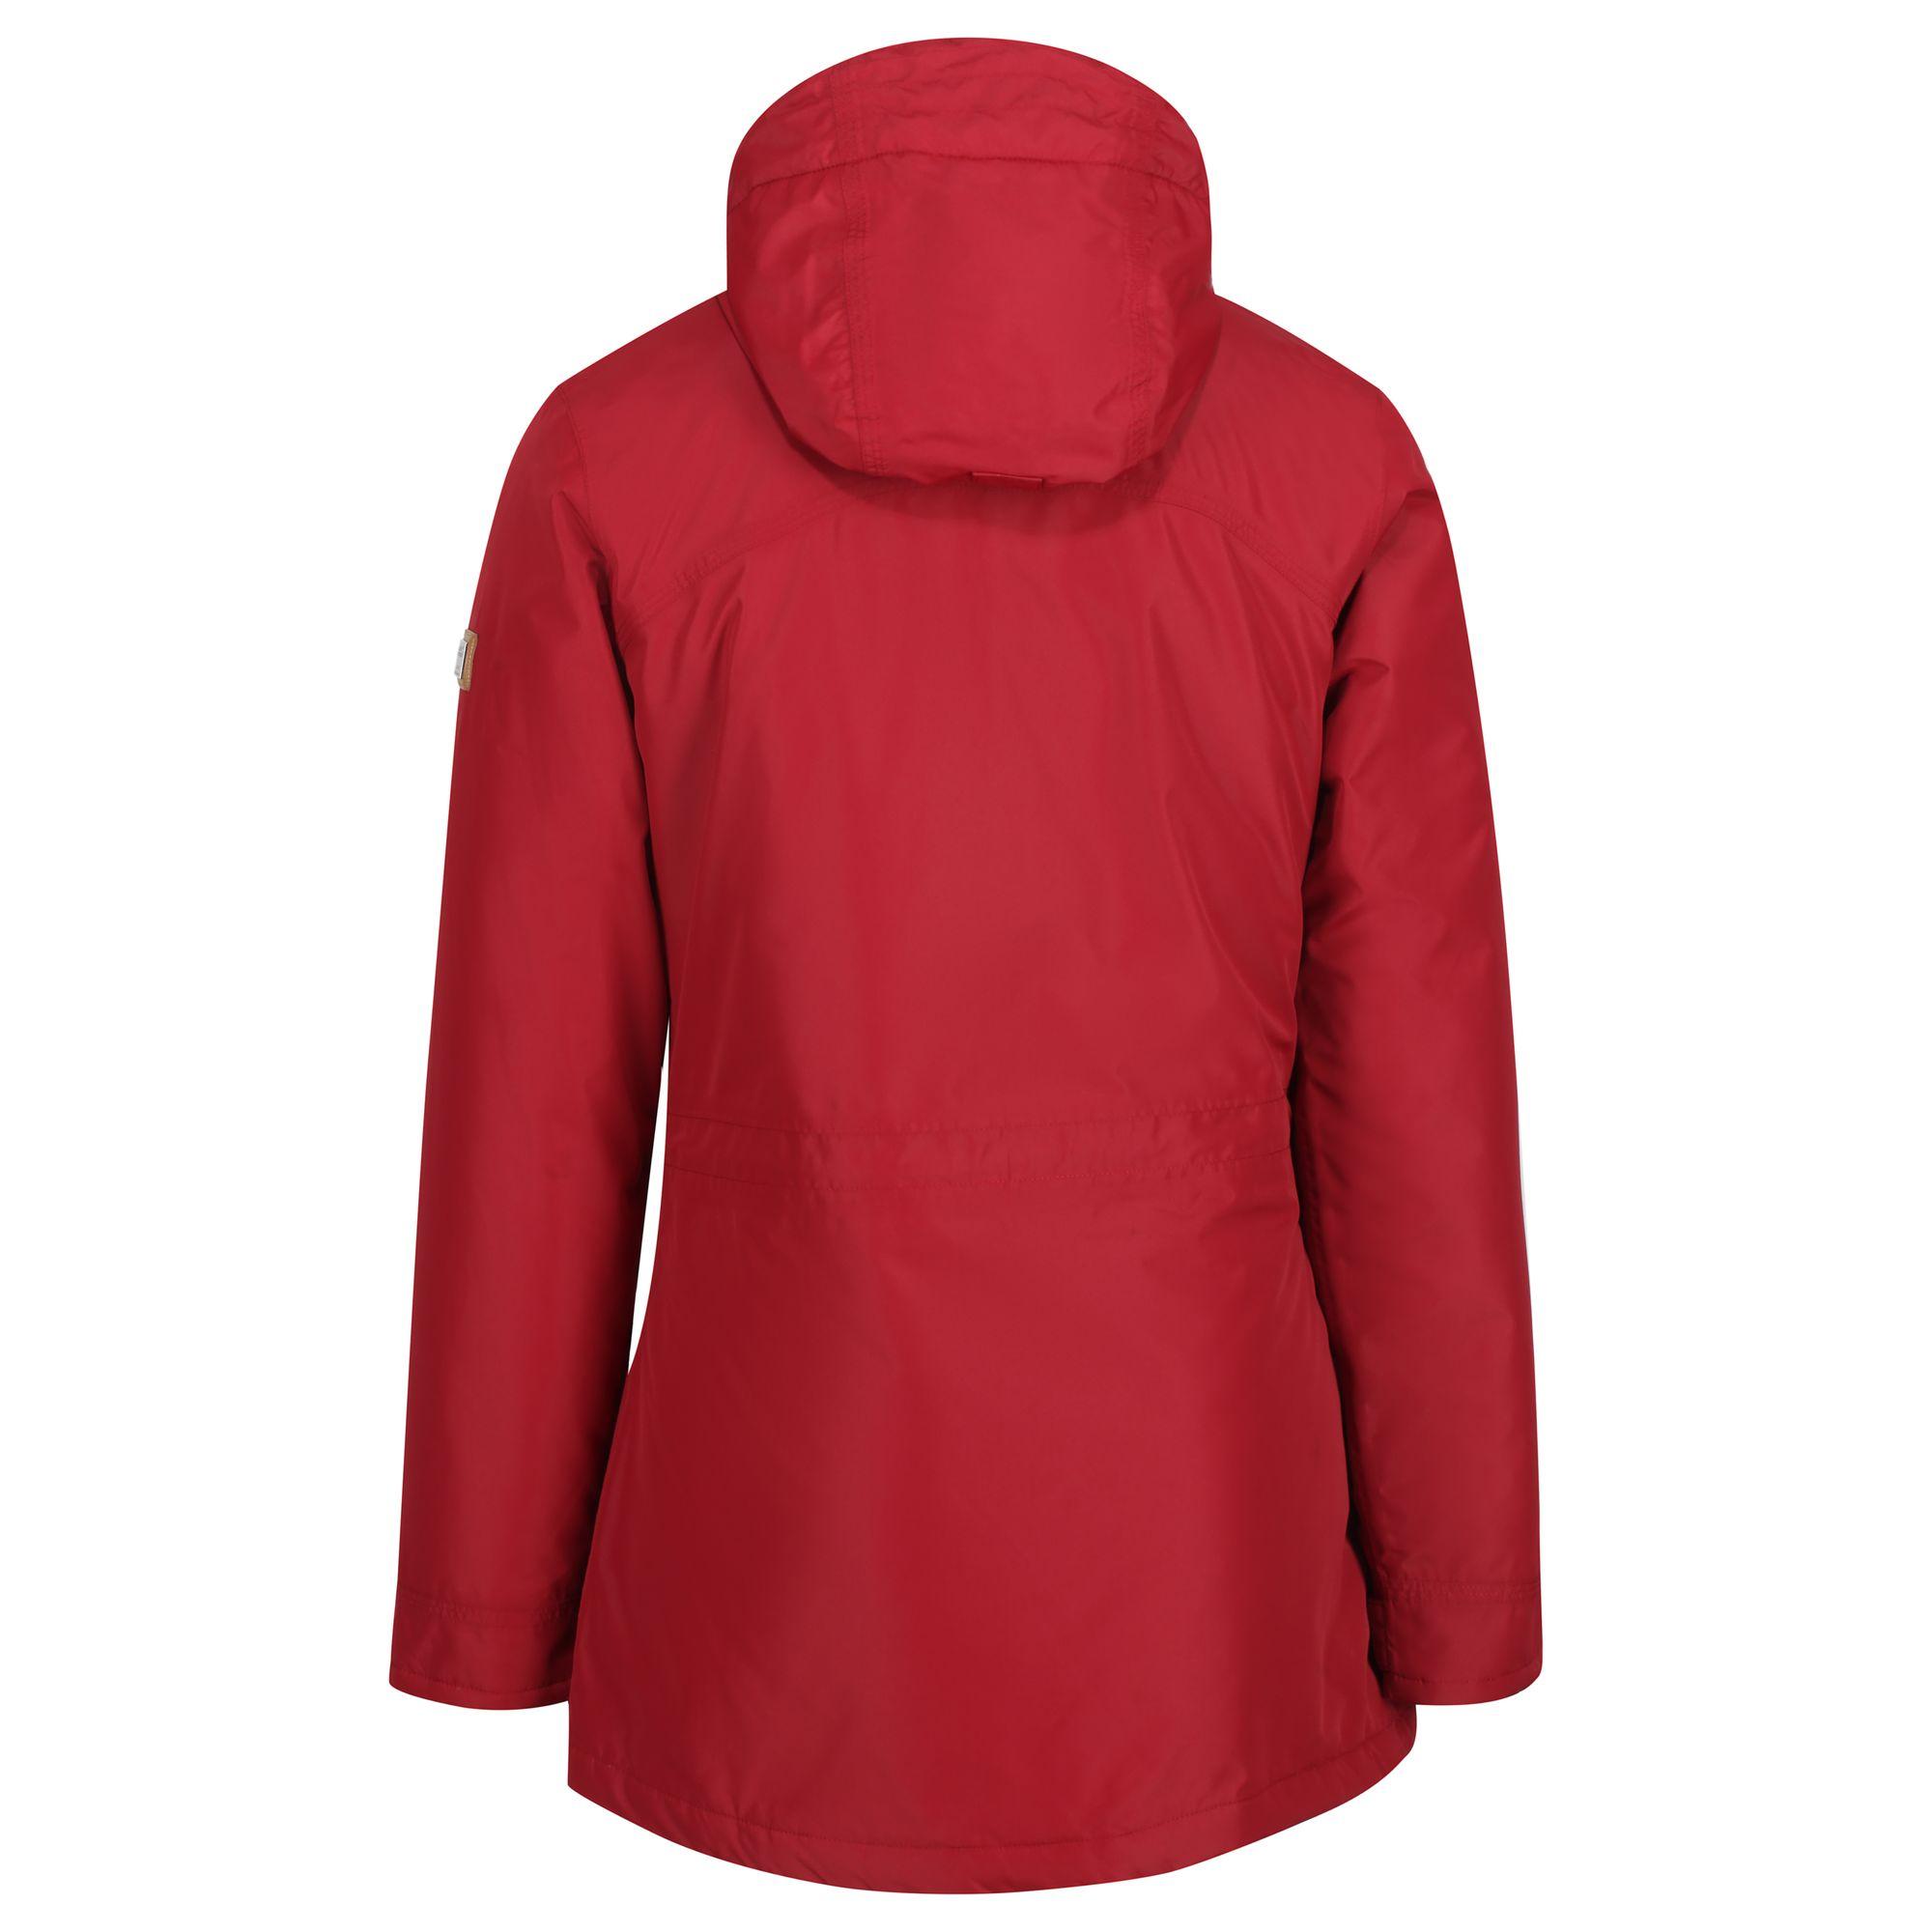 Regatta-Womens-Ladies-Braelynn-Long-Length-Waterproof-Jacket-RG4552 thumbnail 9